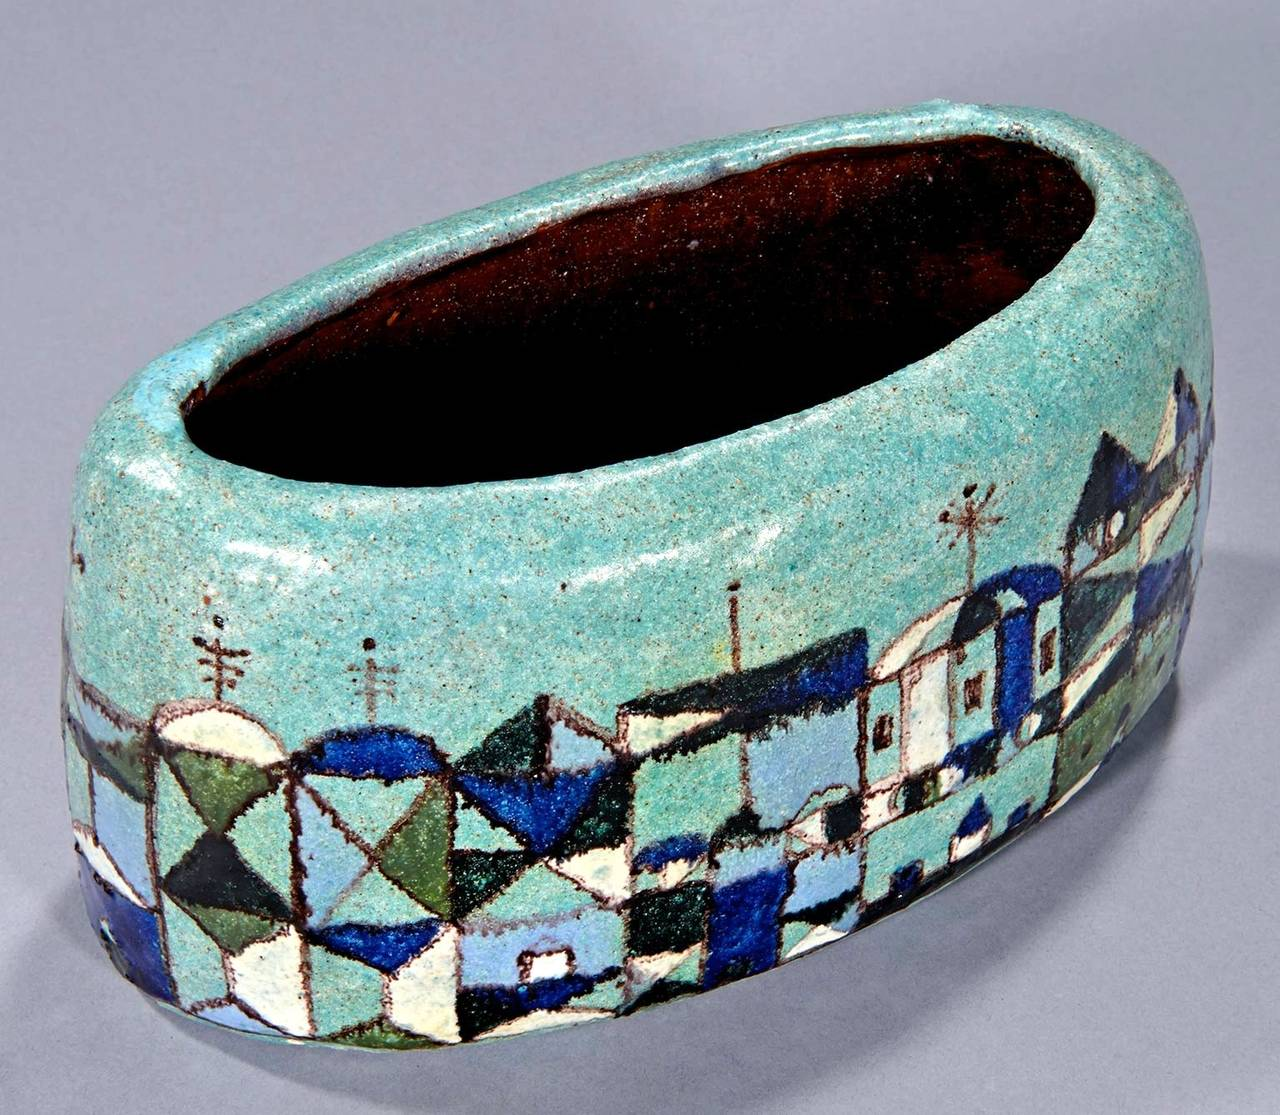 Vase by Ulisse Pagliari 3